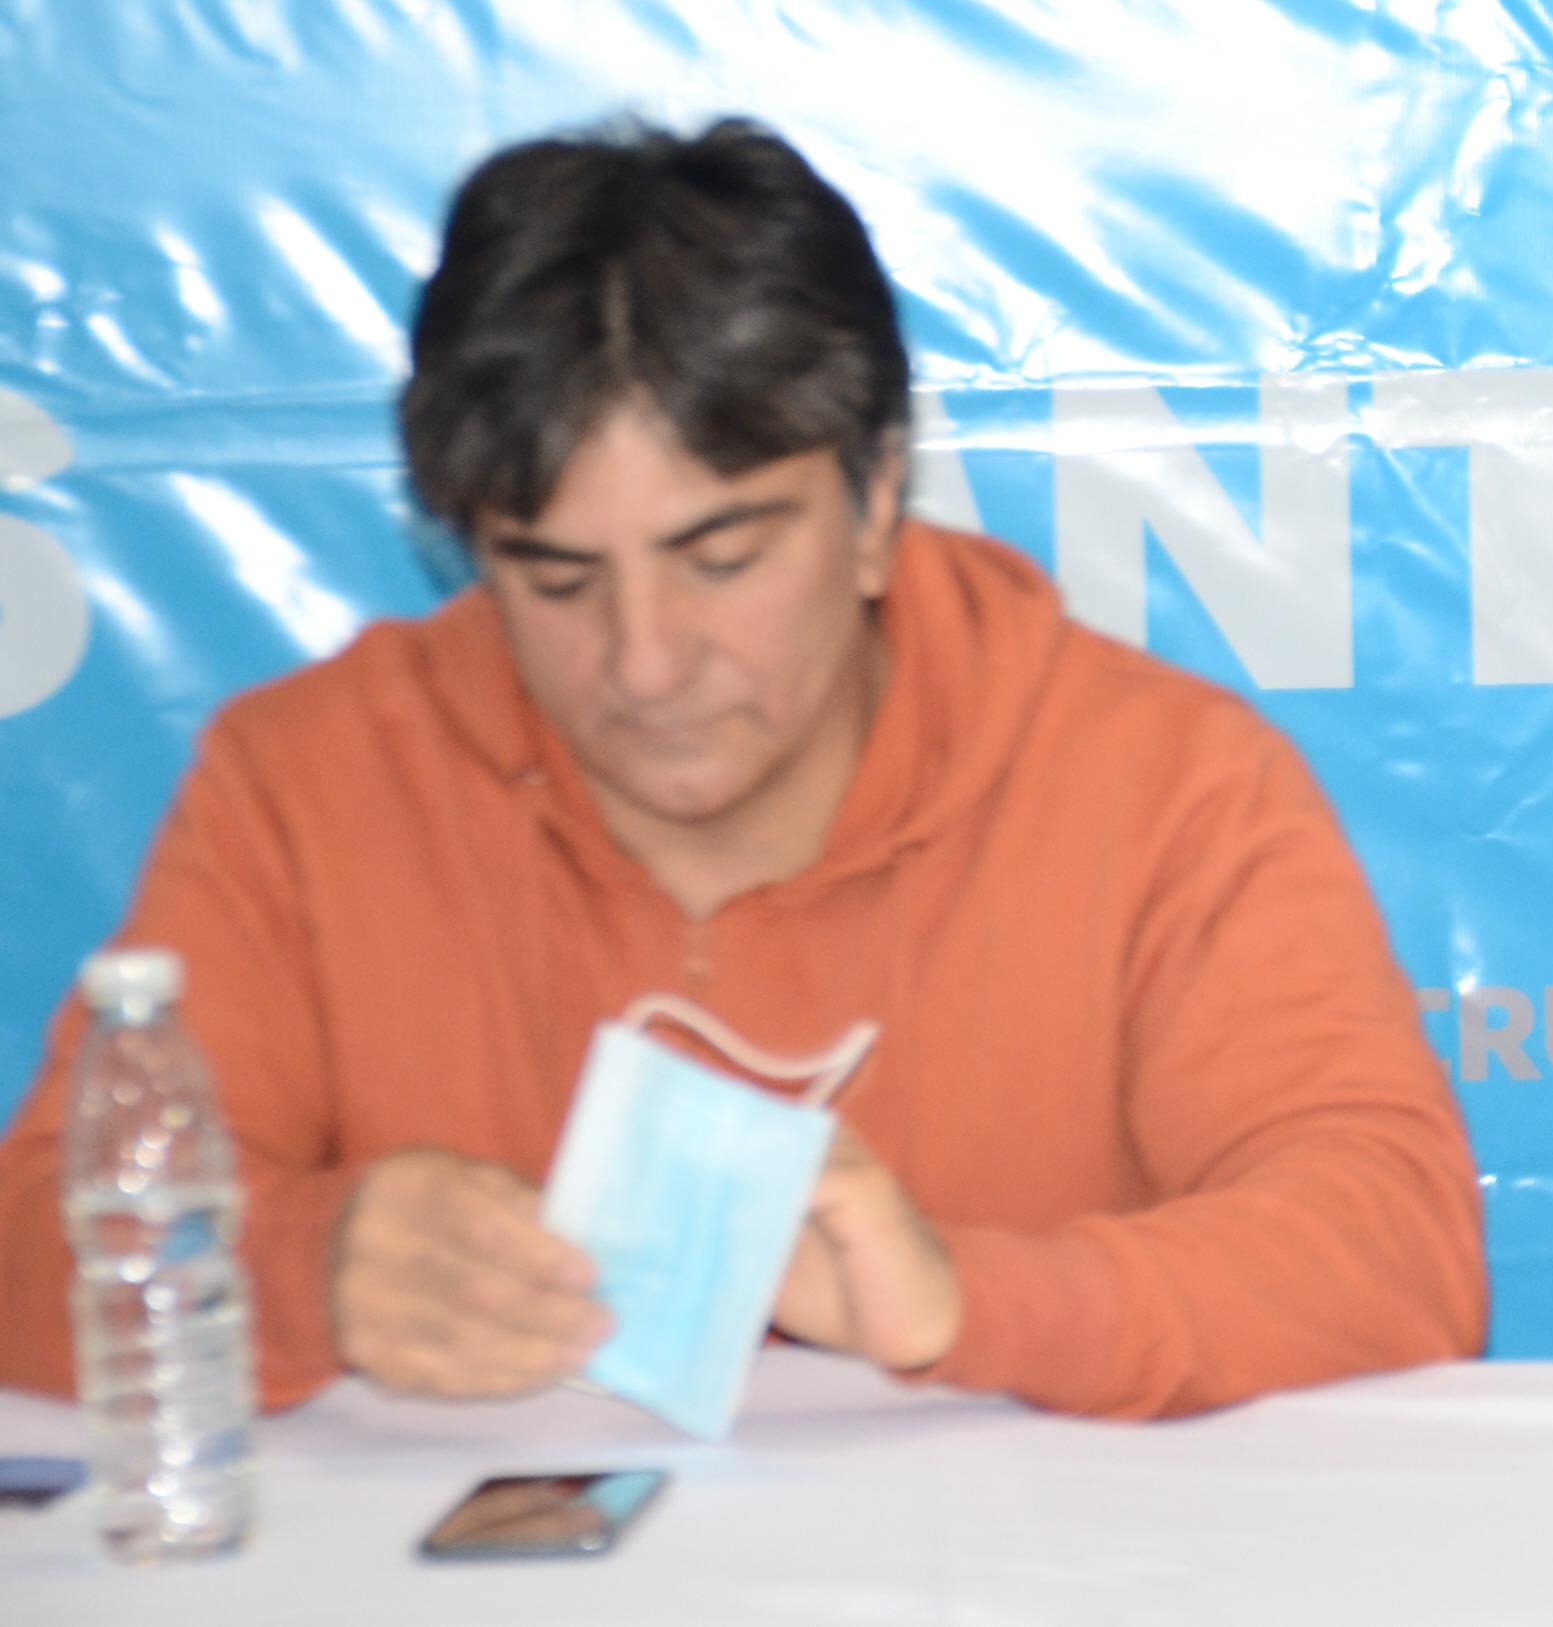 Juan Vázquez